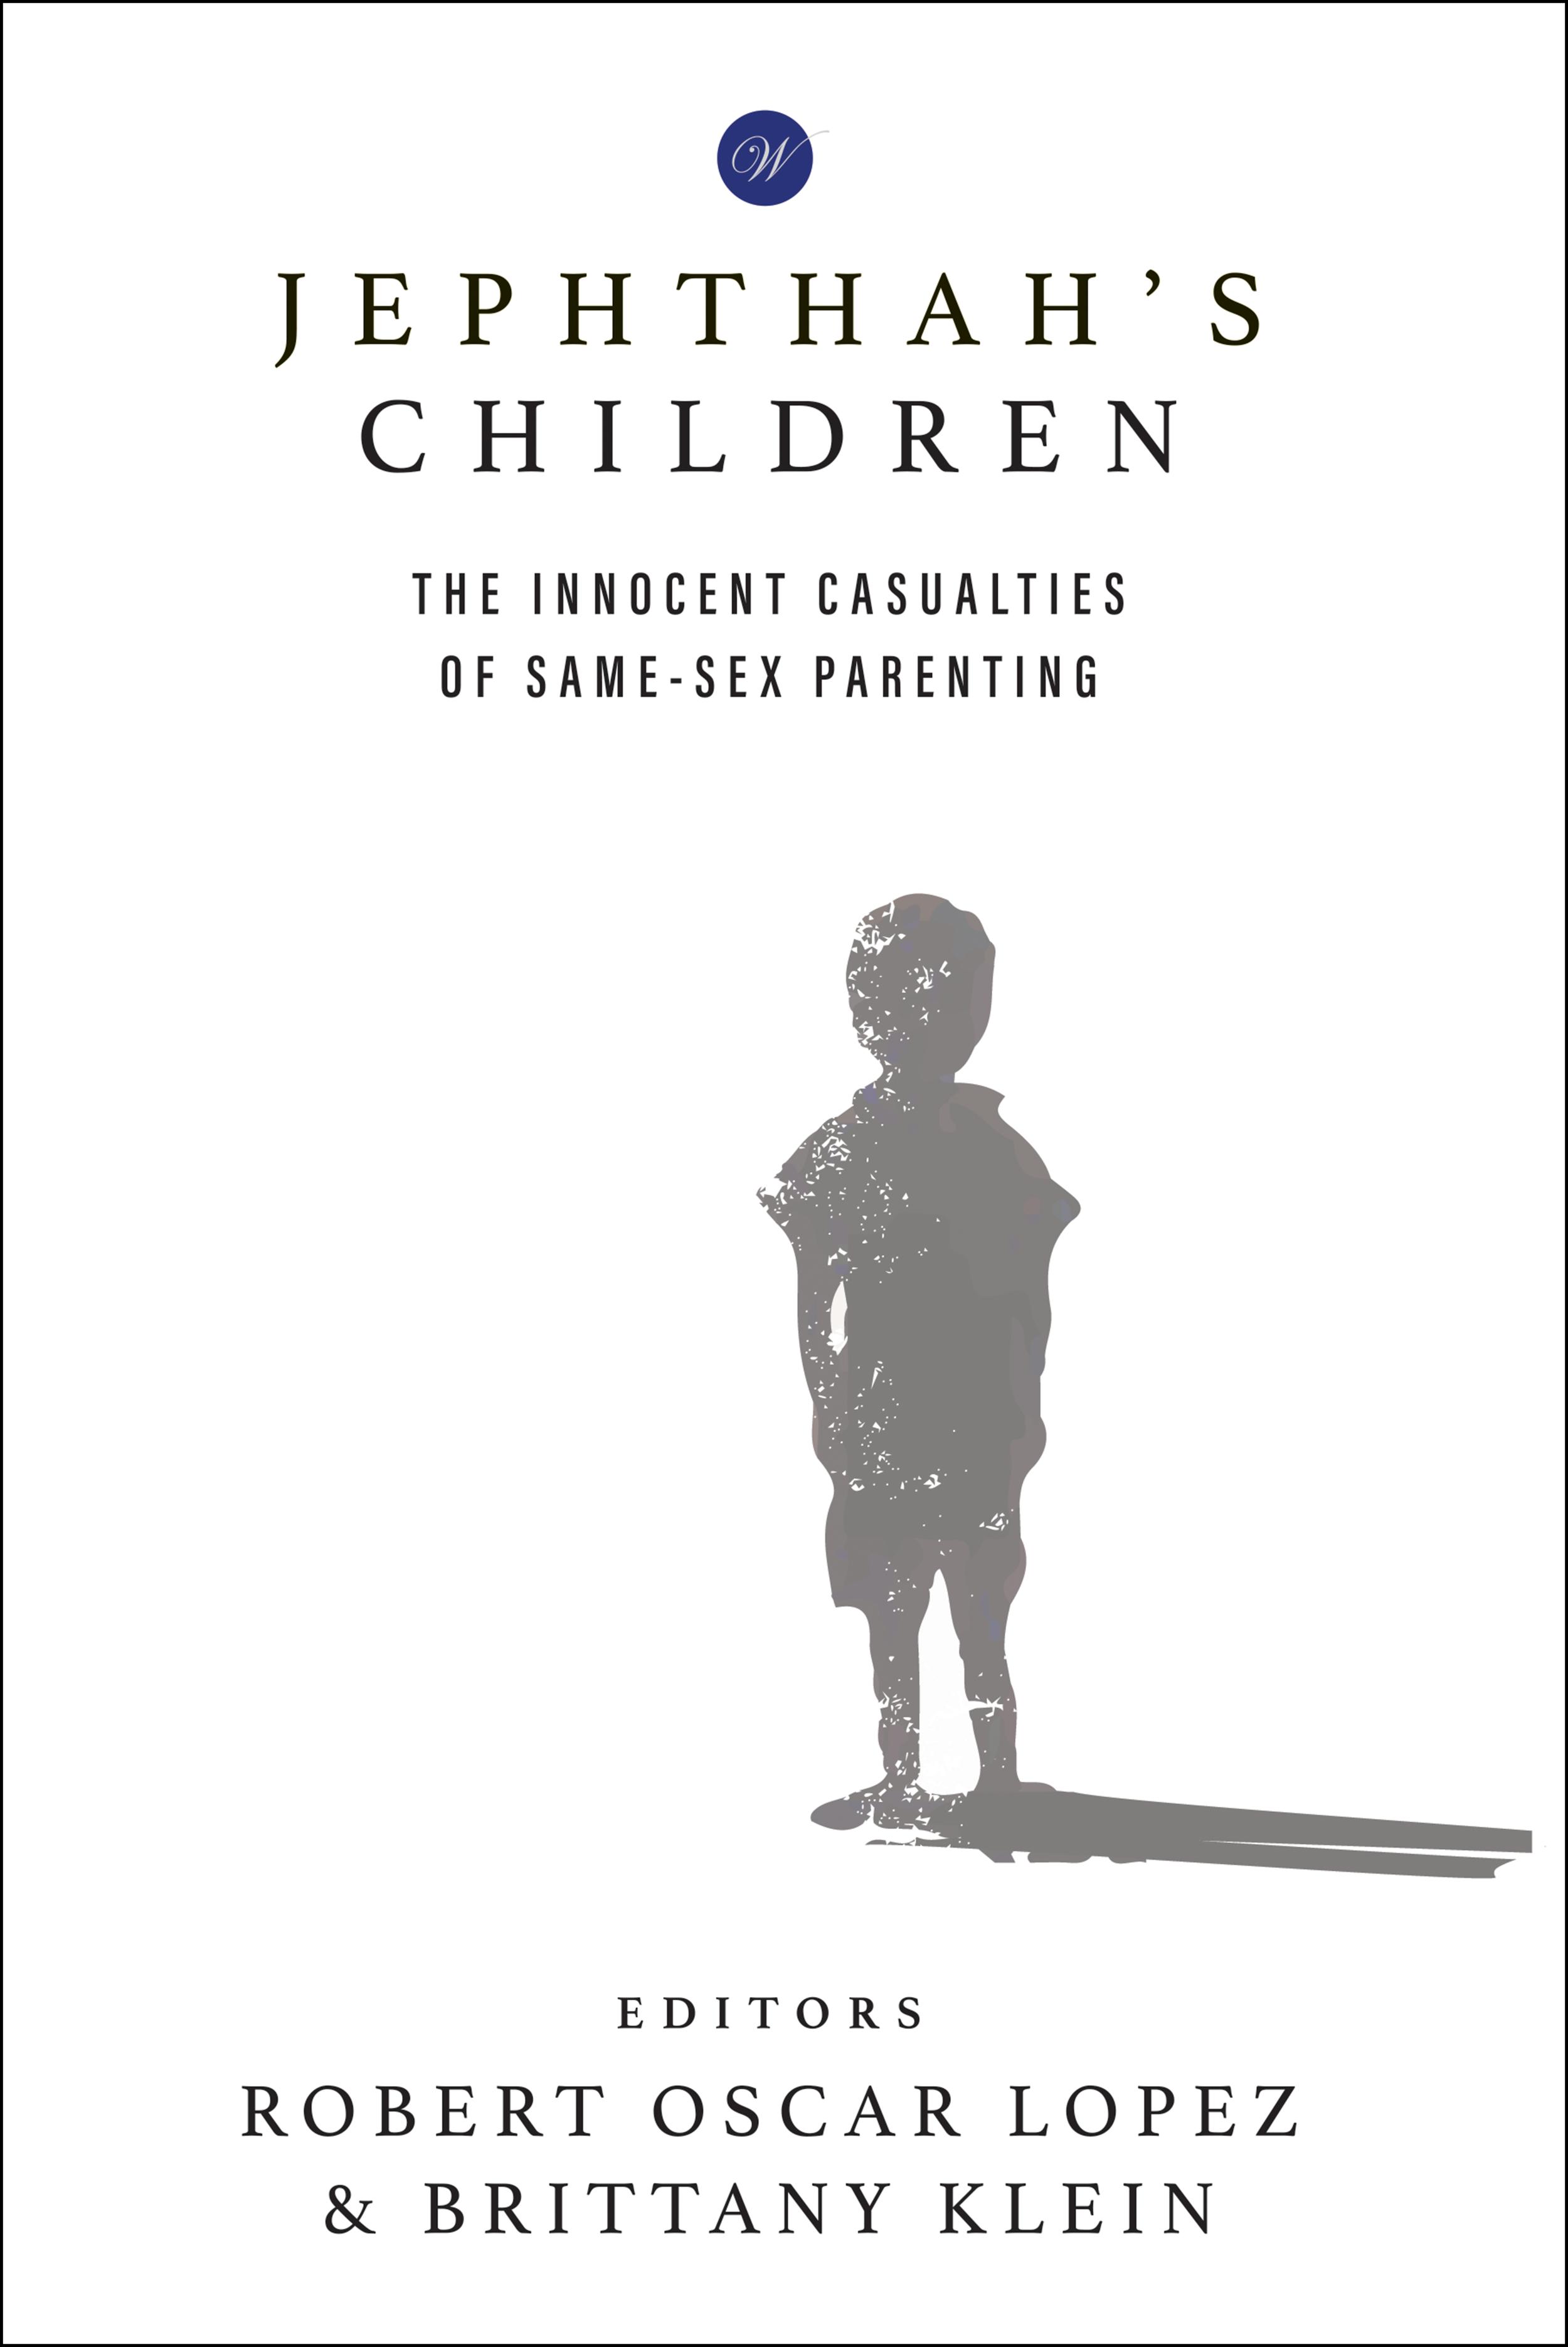 Jephthah's Children - Tells the heartfelt personal stories of children raised by same-sex parents